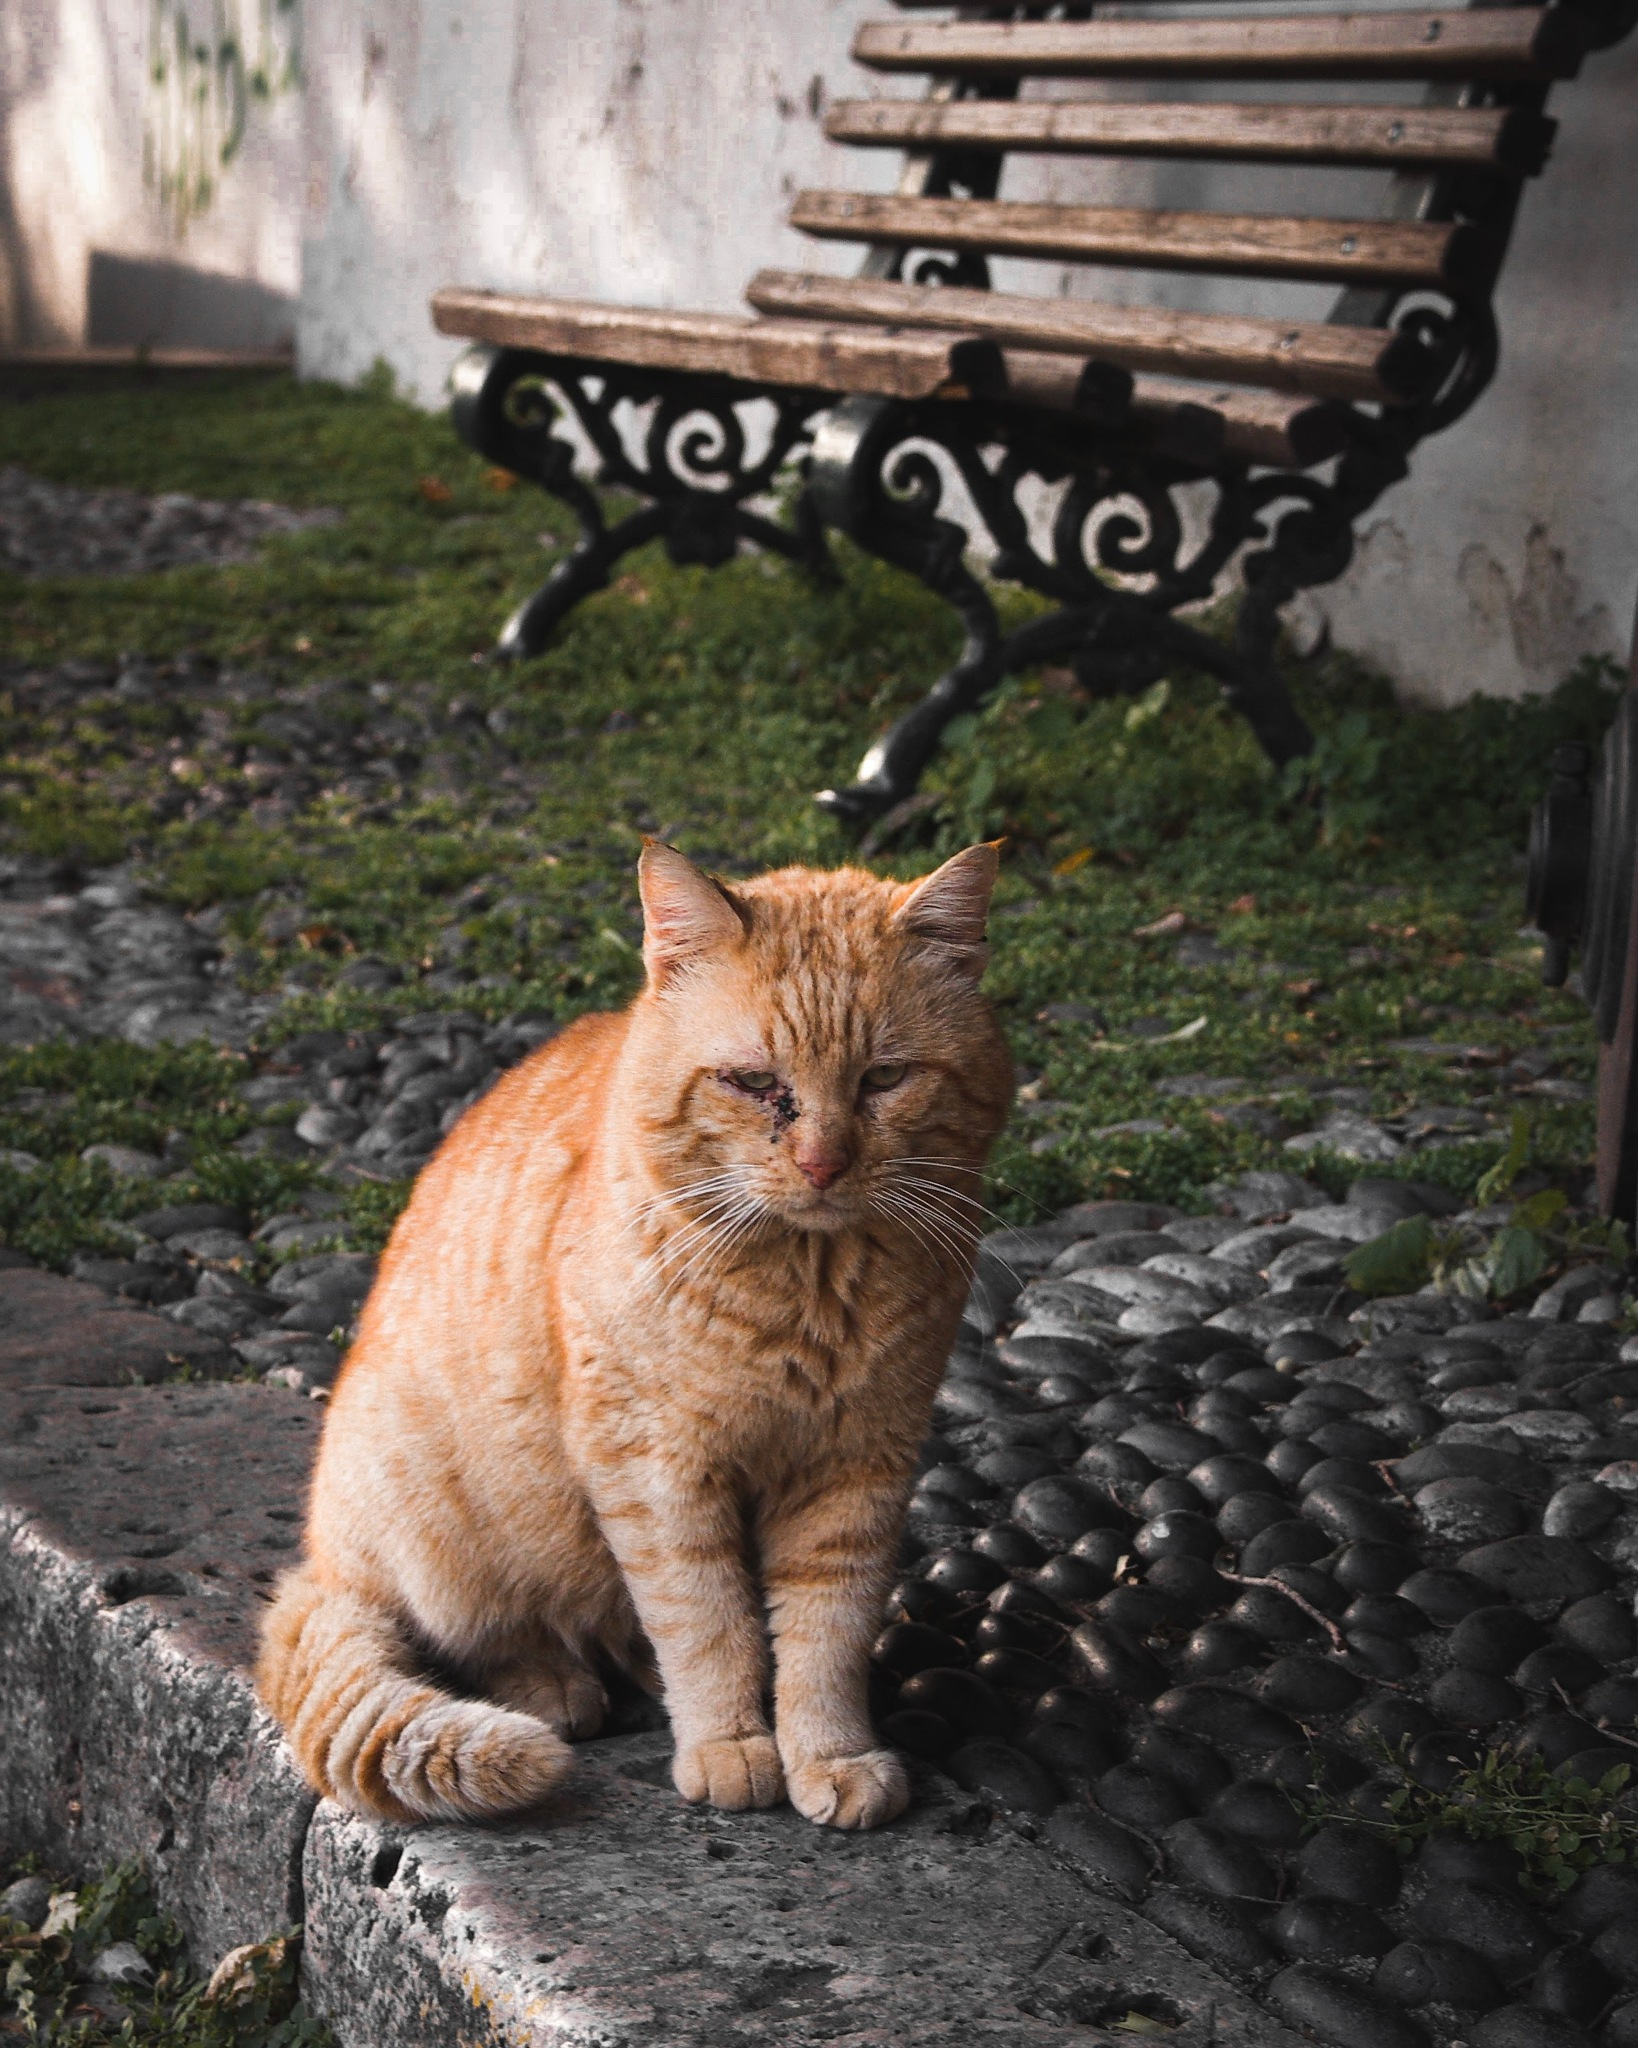 Stray Cat  by Patroklos Papalexis